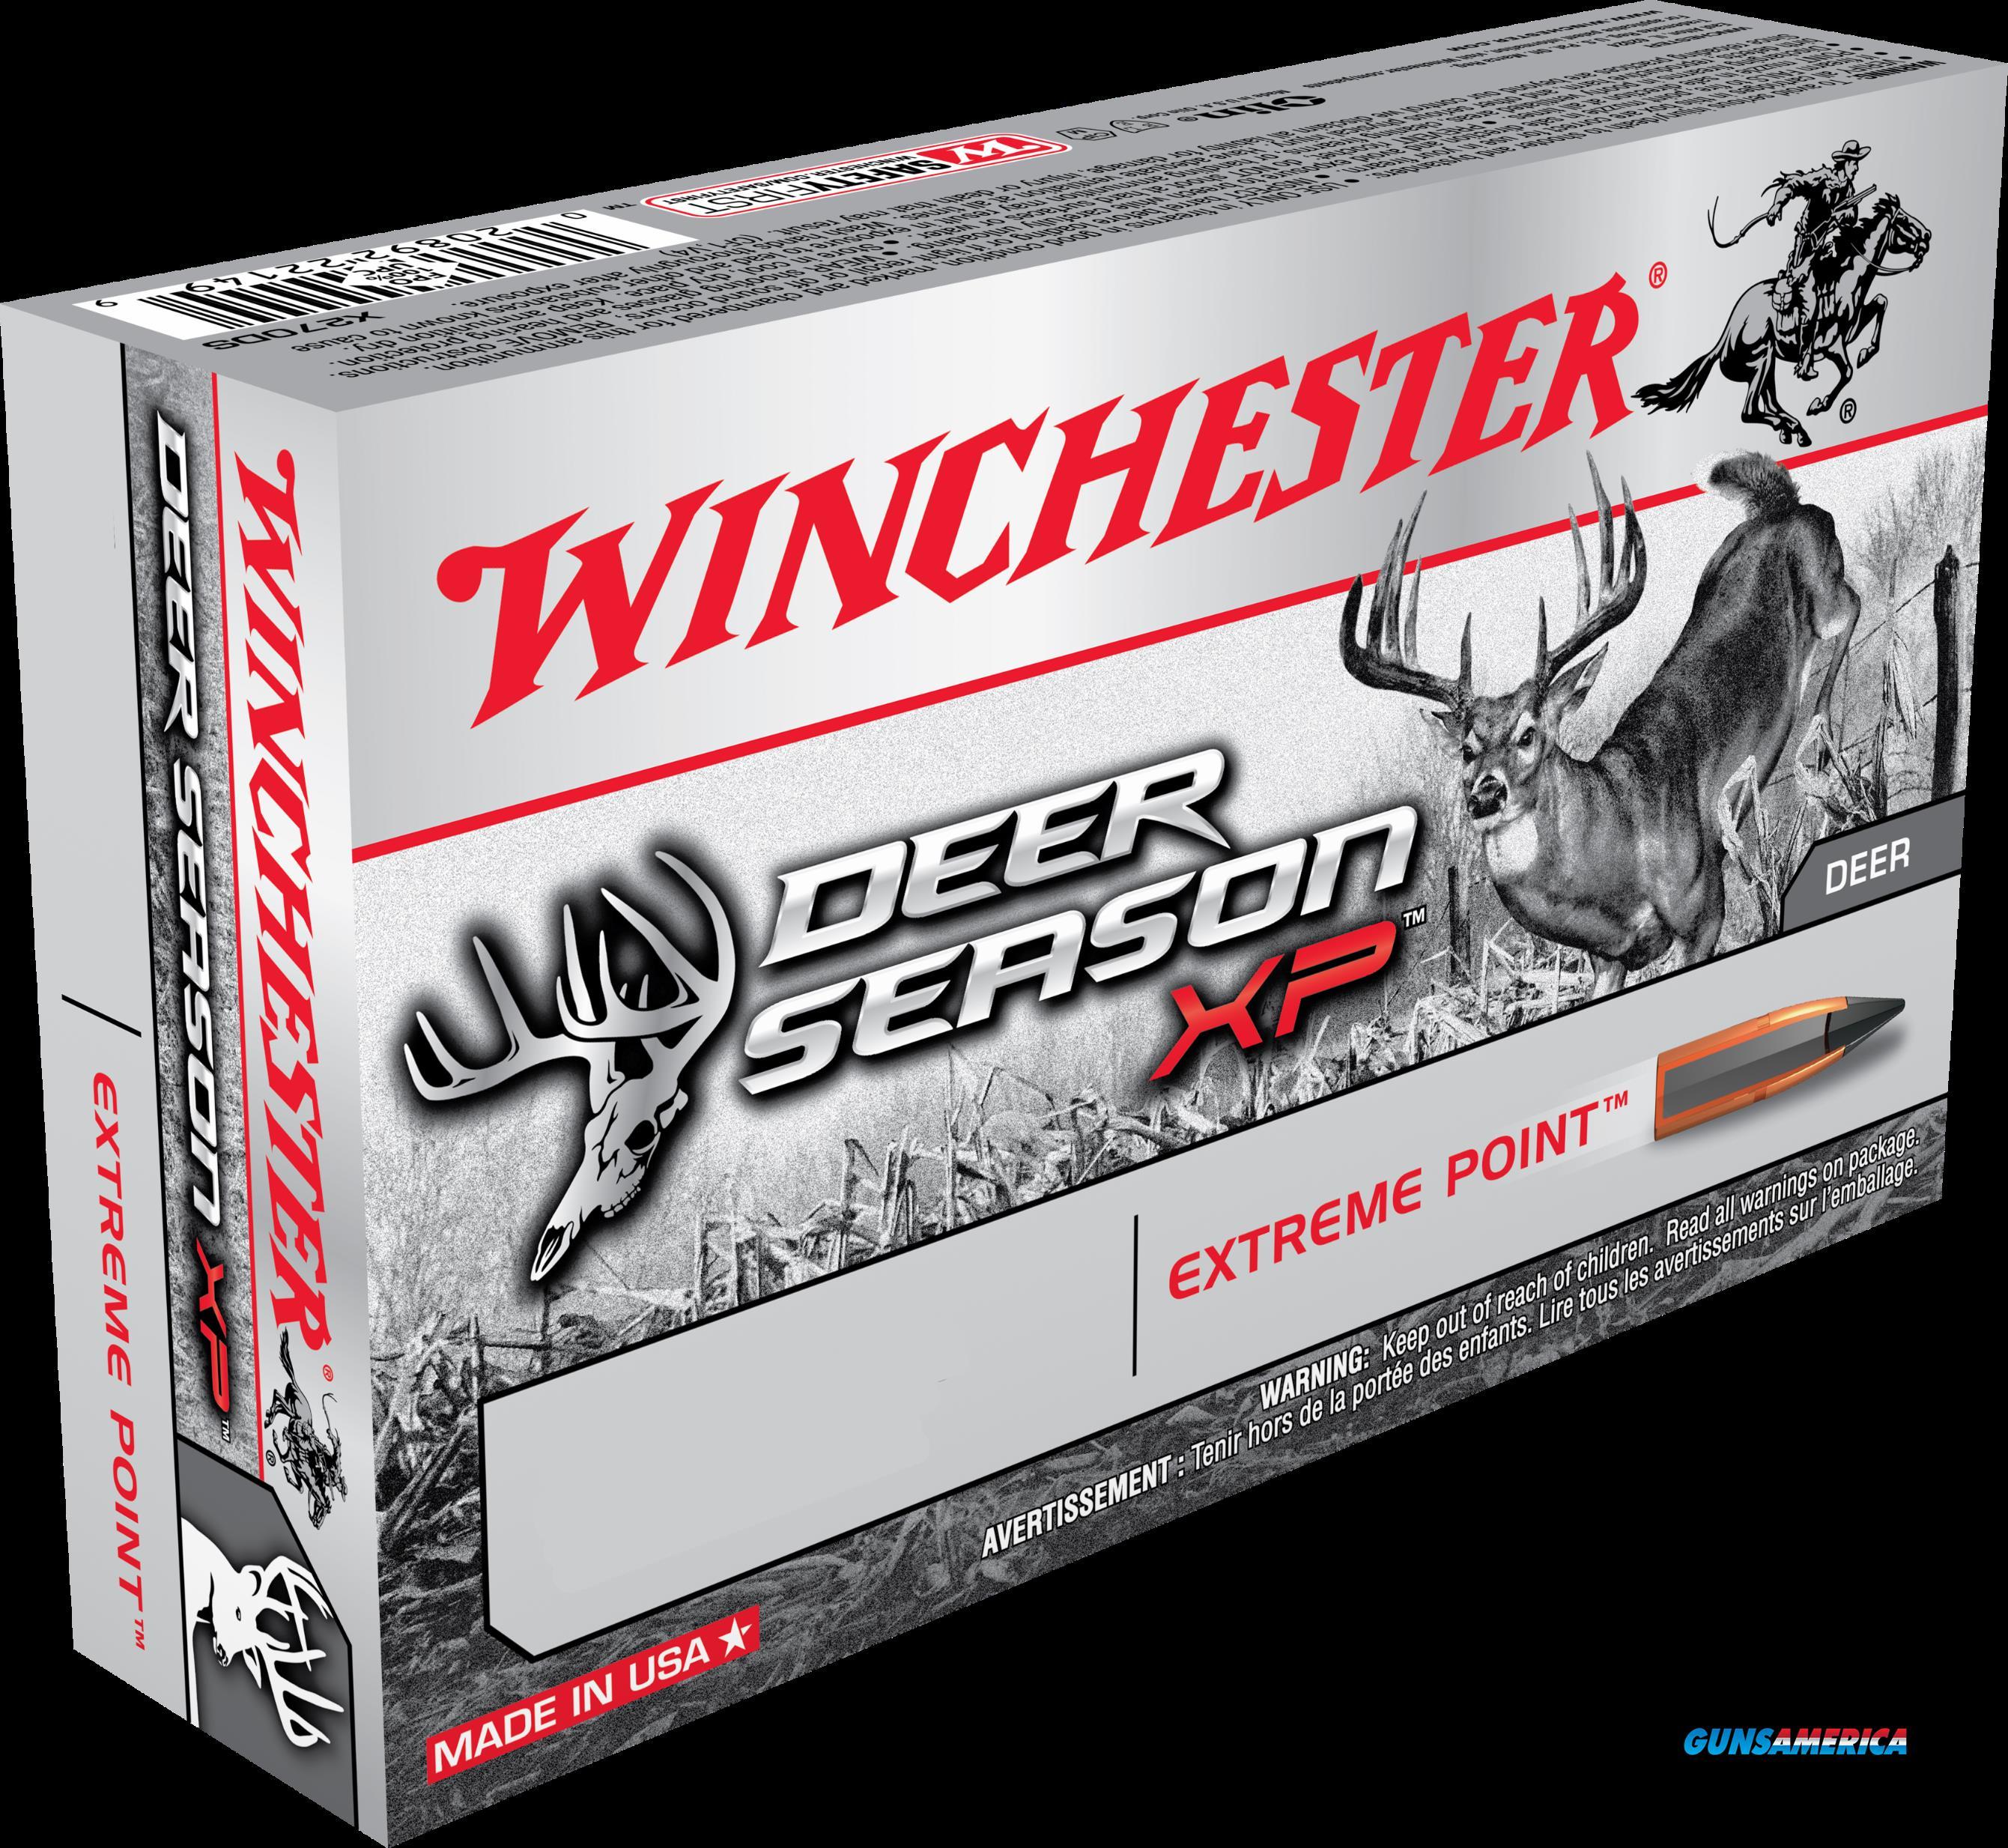 Winchester Ammo Deer Season Xp, Win X223ds   Deer 223     64ep   20-10  Guns > Pistols > 1911 Pistol Copies (non-Colt)